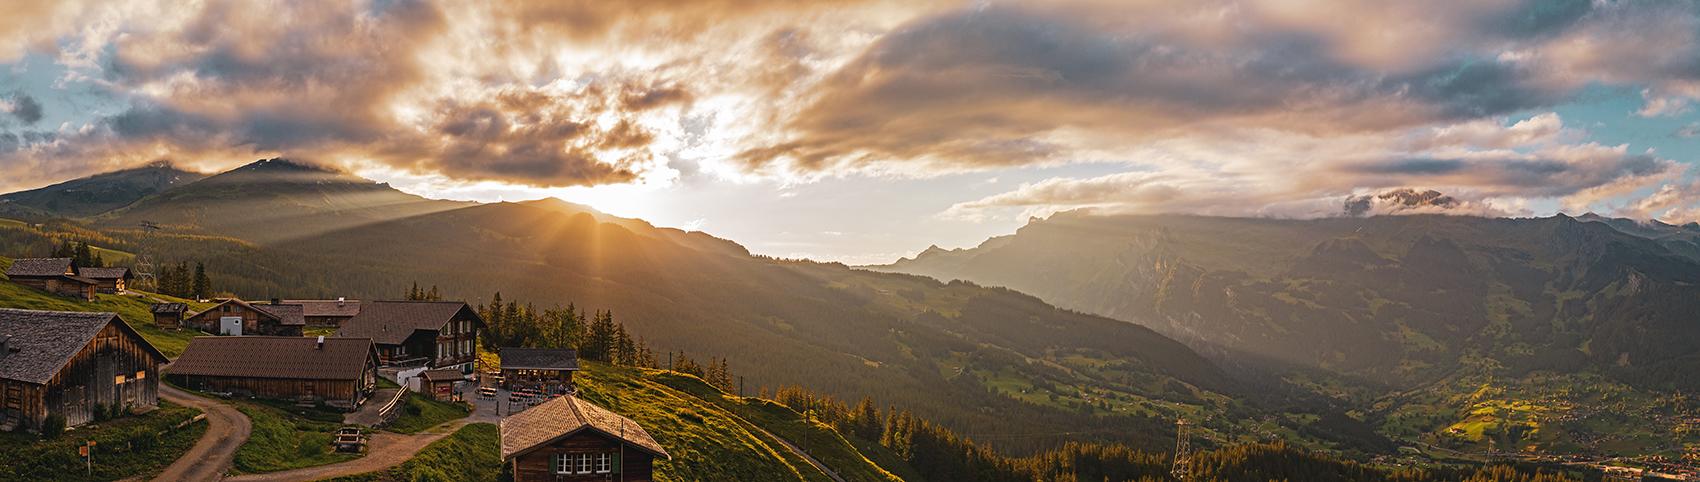 Eiger_Grindelwald2.jpg